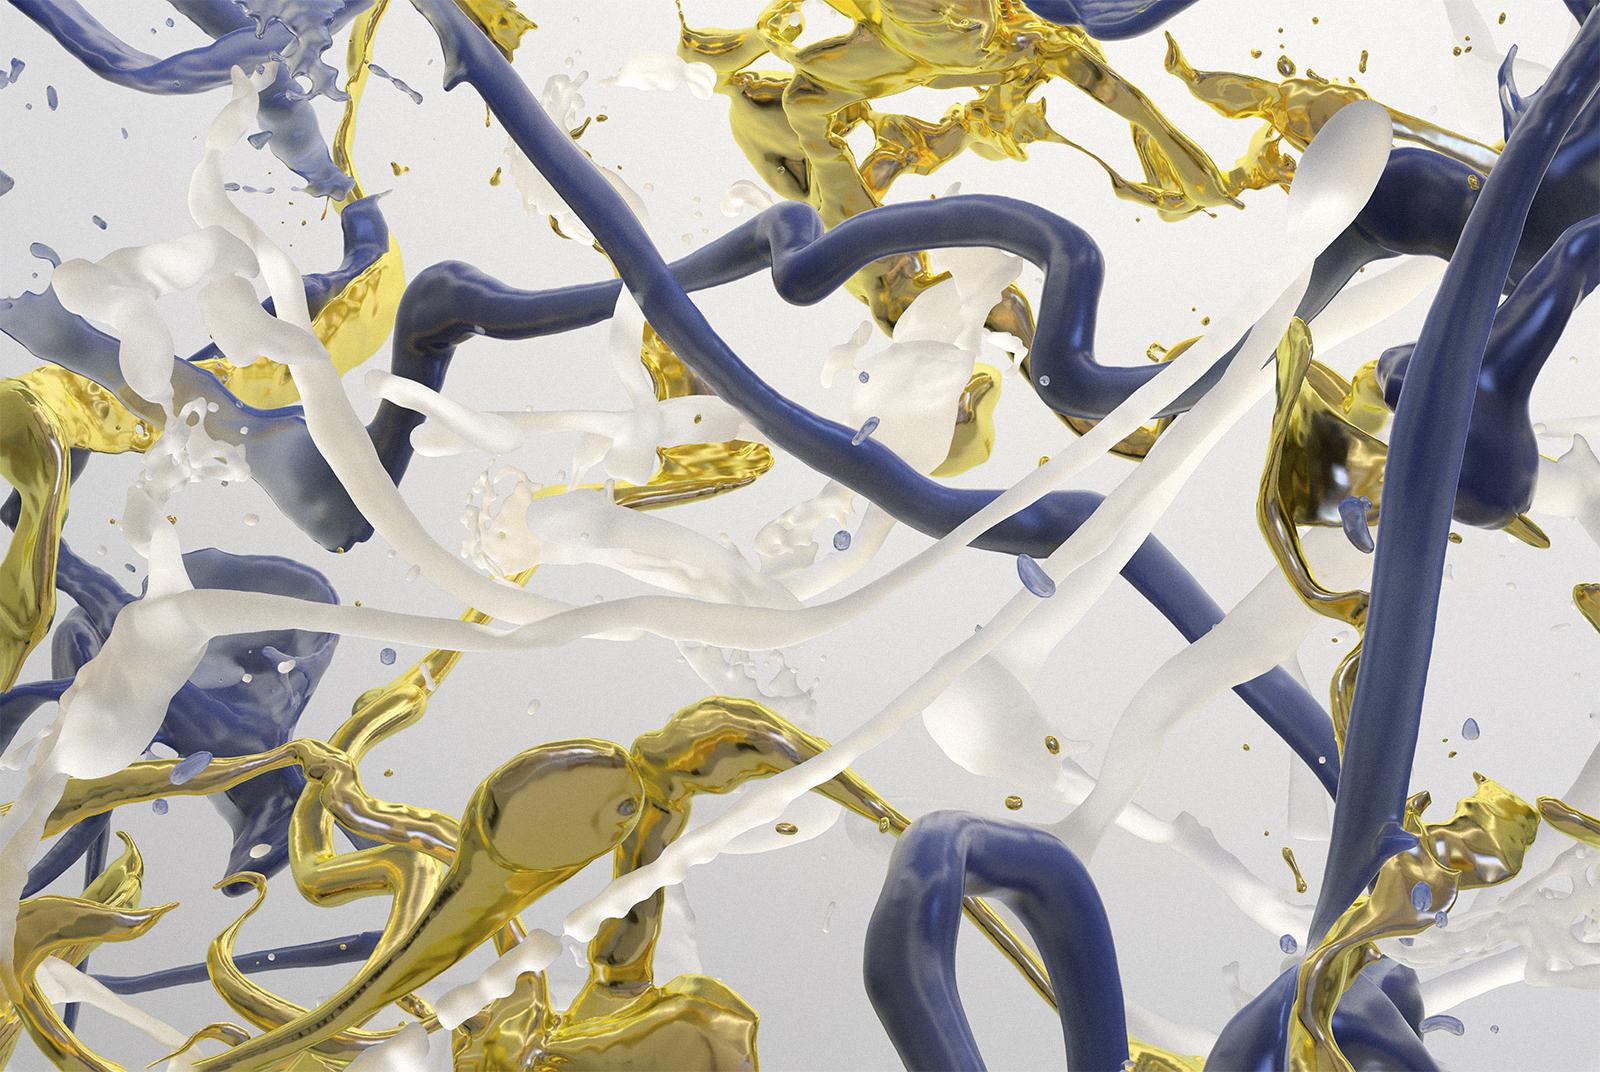 Bodypaint V 22, CGI Fine Art Print, 70 x 105 cm, 2020